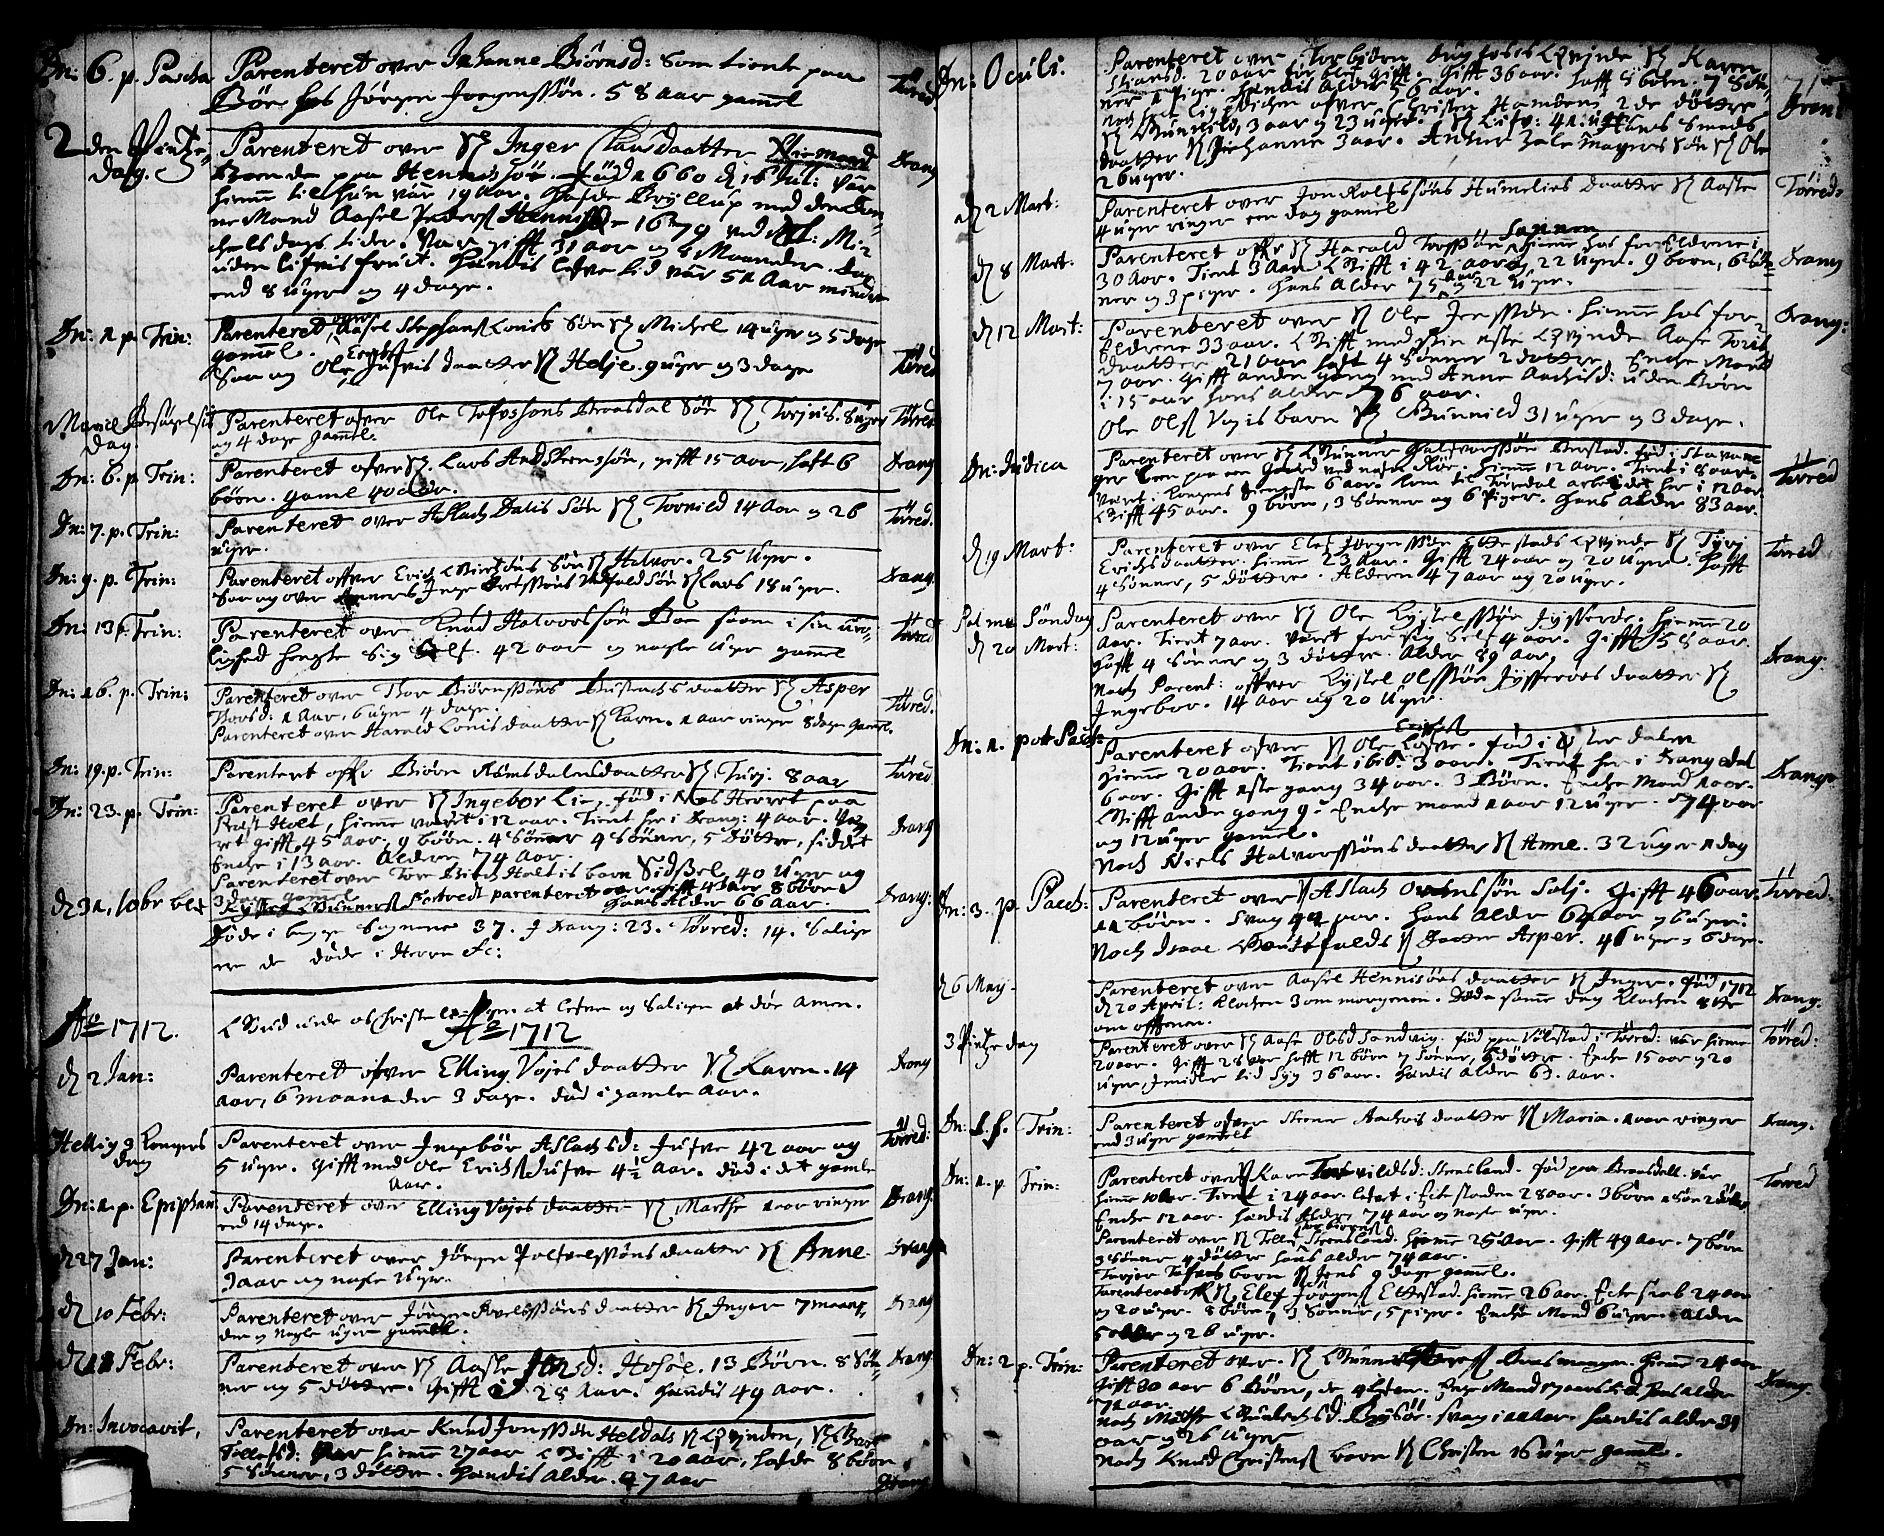 SAKO, Drangedal kirkebøker, F/Fa/L0001: Ministerialbok nr. 1, 1697-1767, s. 71